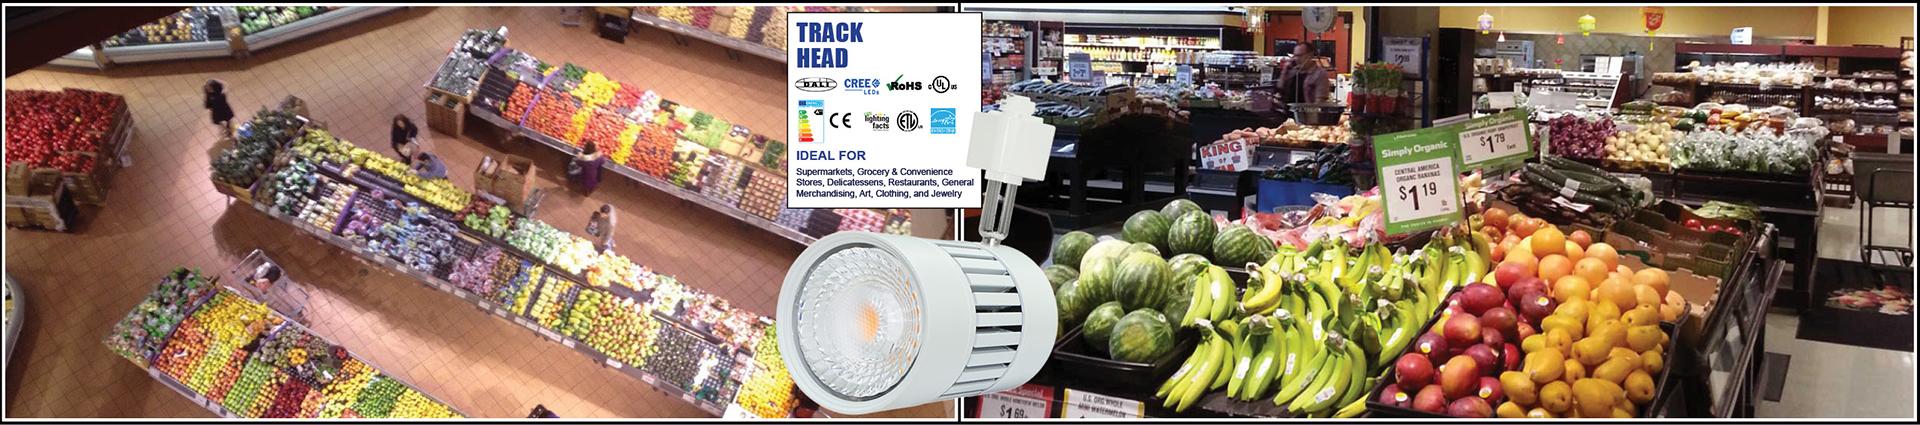 produce-trackhead